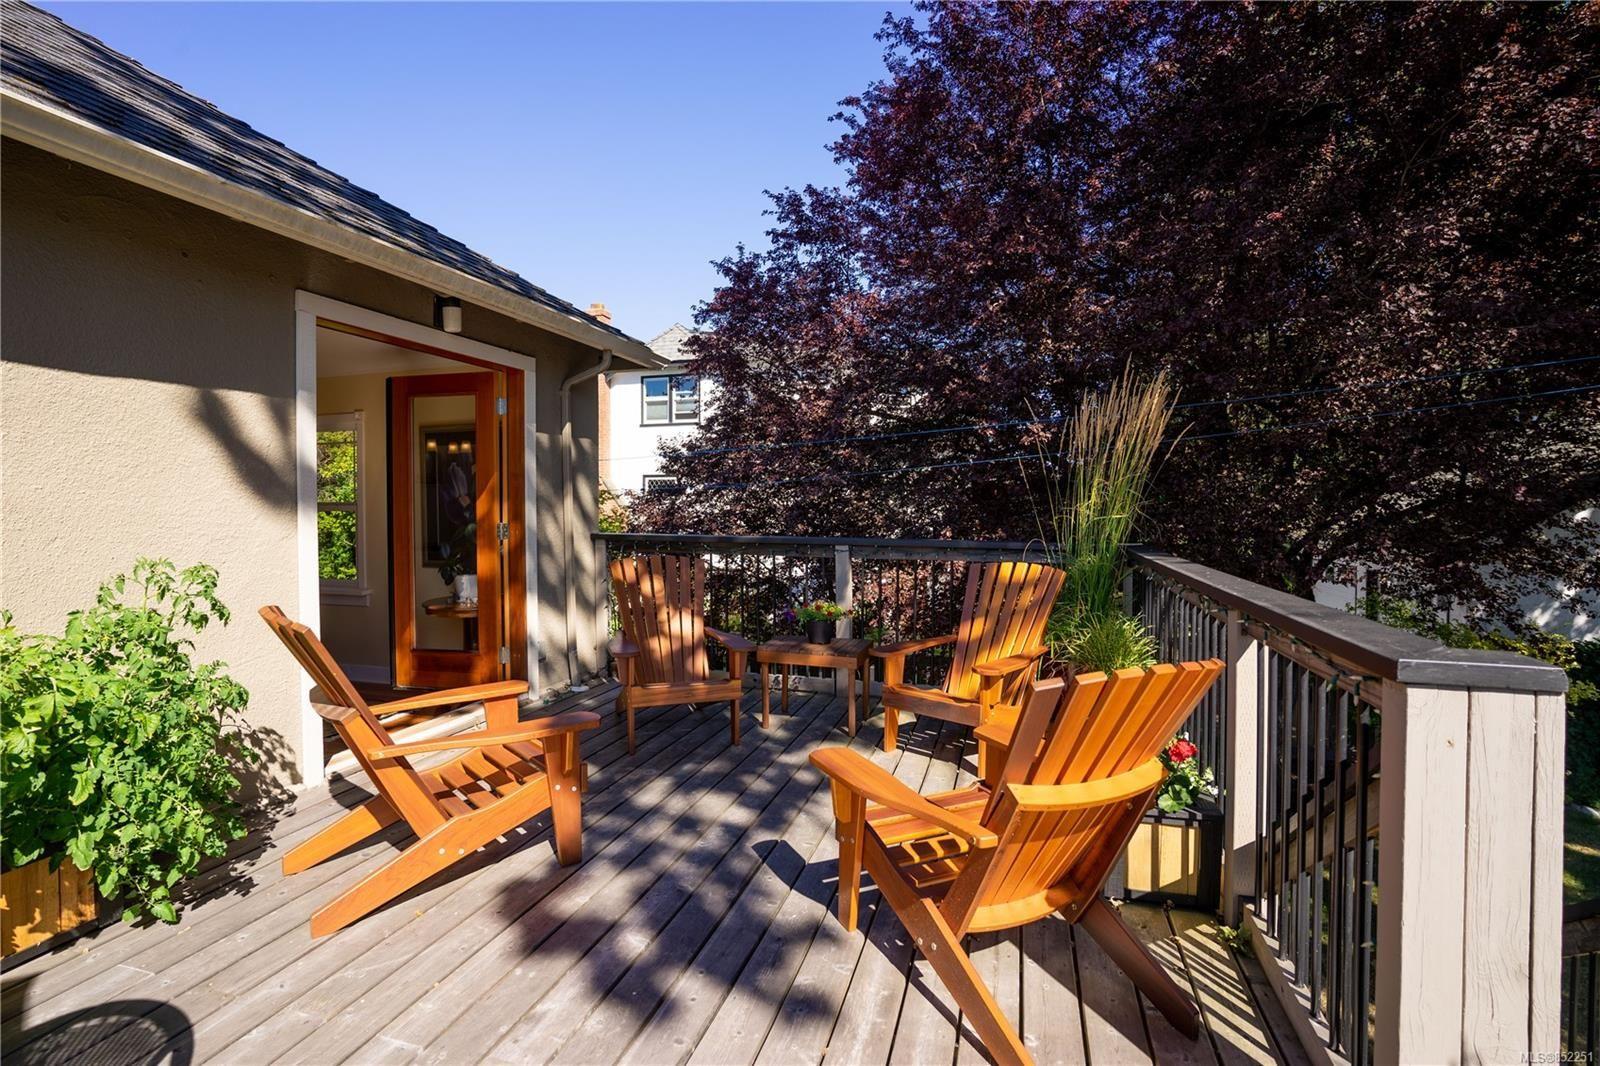 Photo 9: Photos: 2363 Pacific Ave in : OB Estevan House for sale (Oak Bay)  : MLS®# 852251